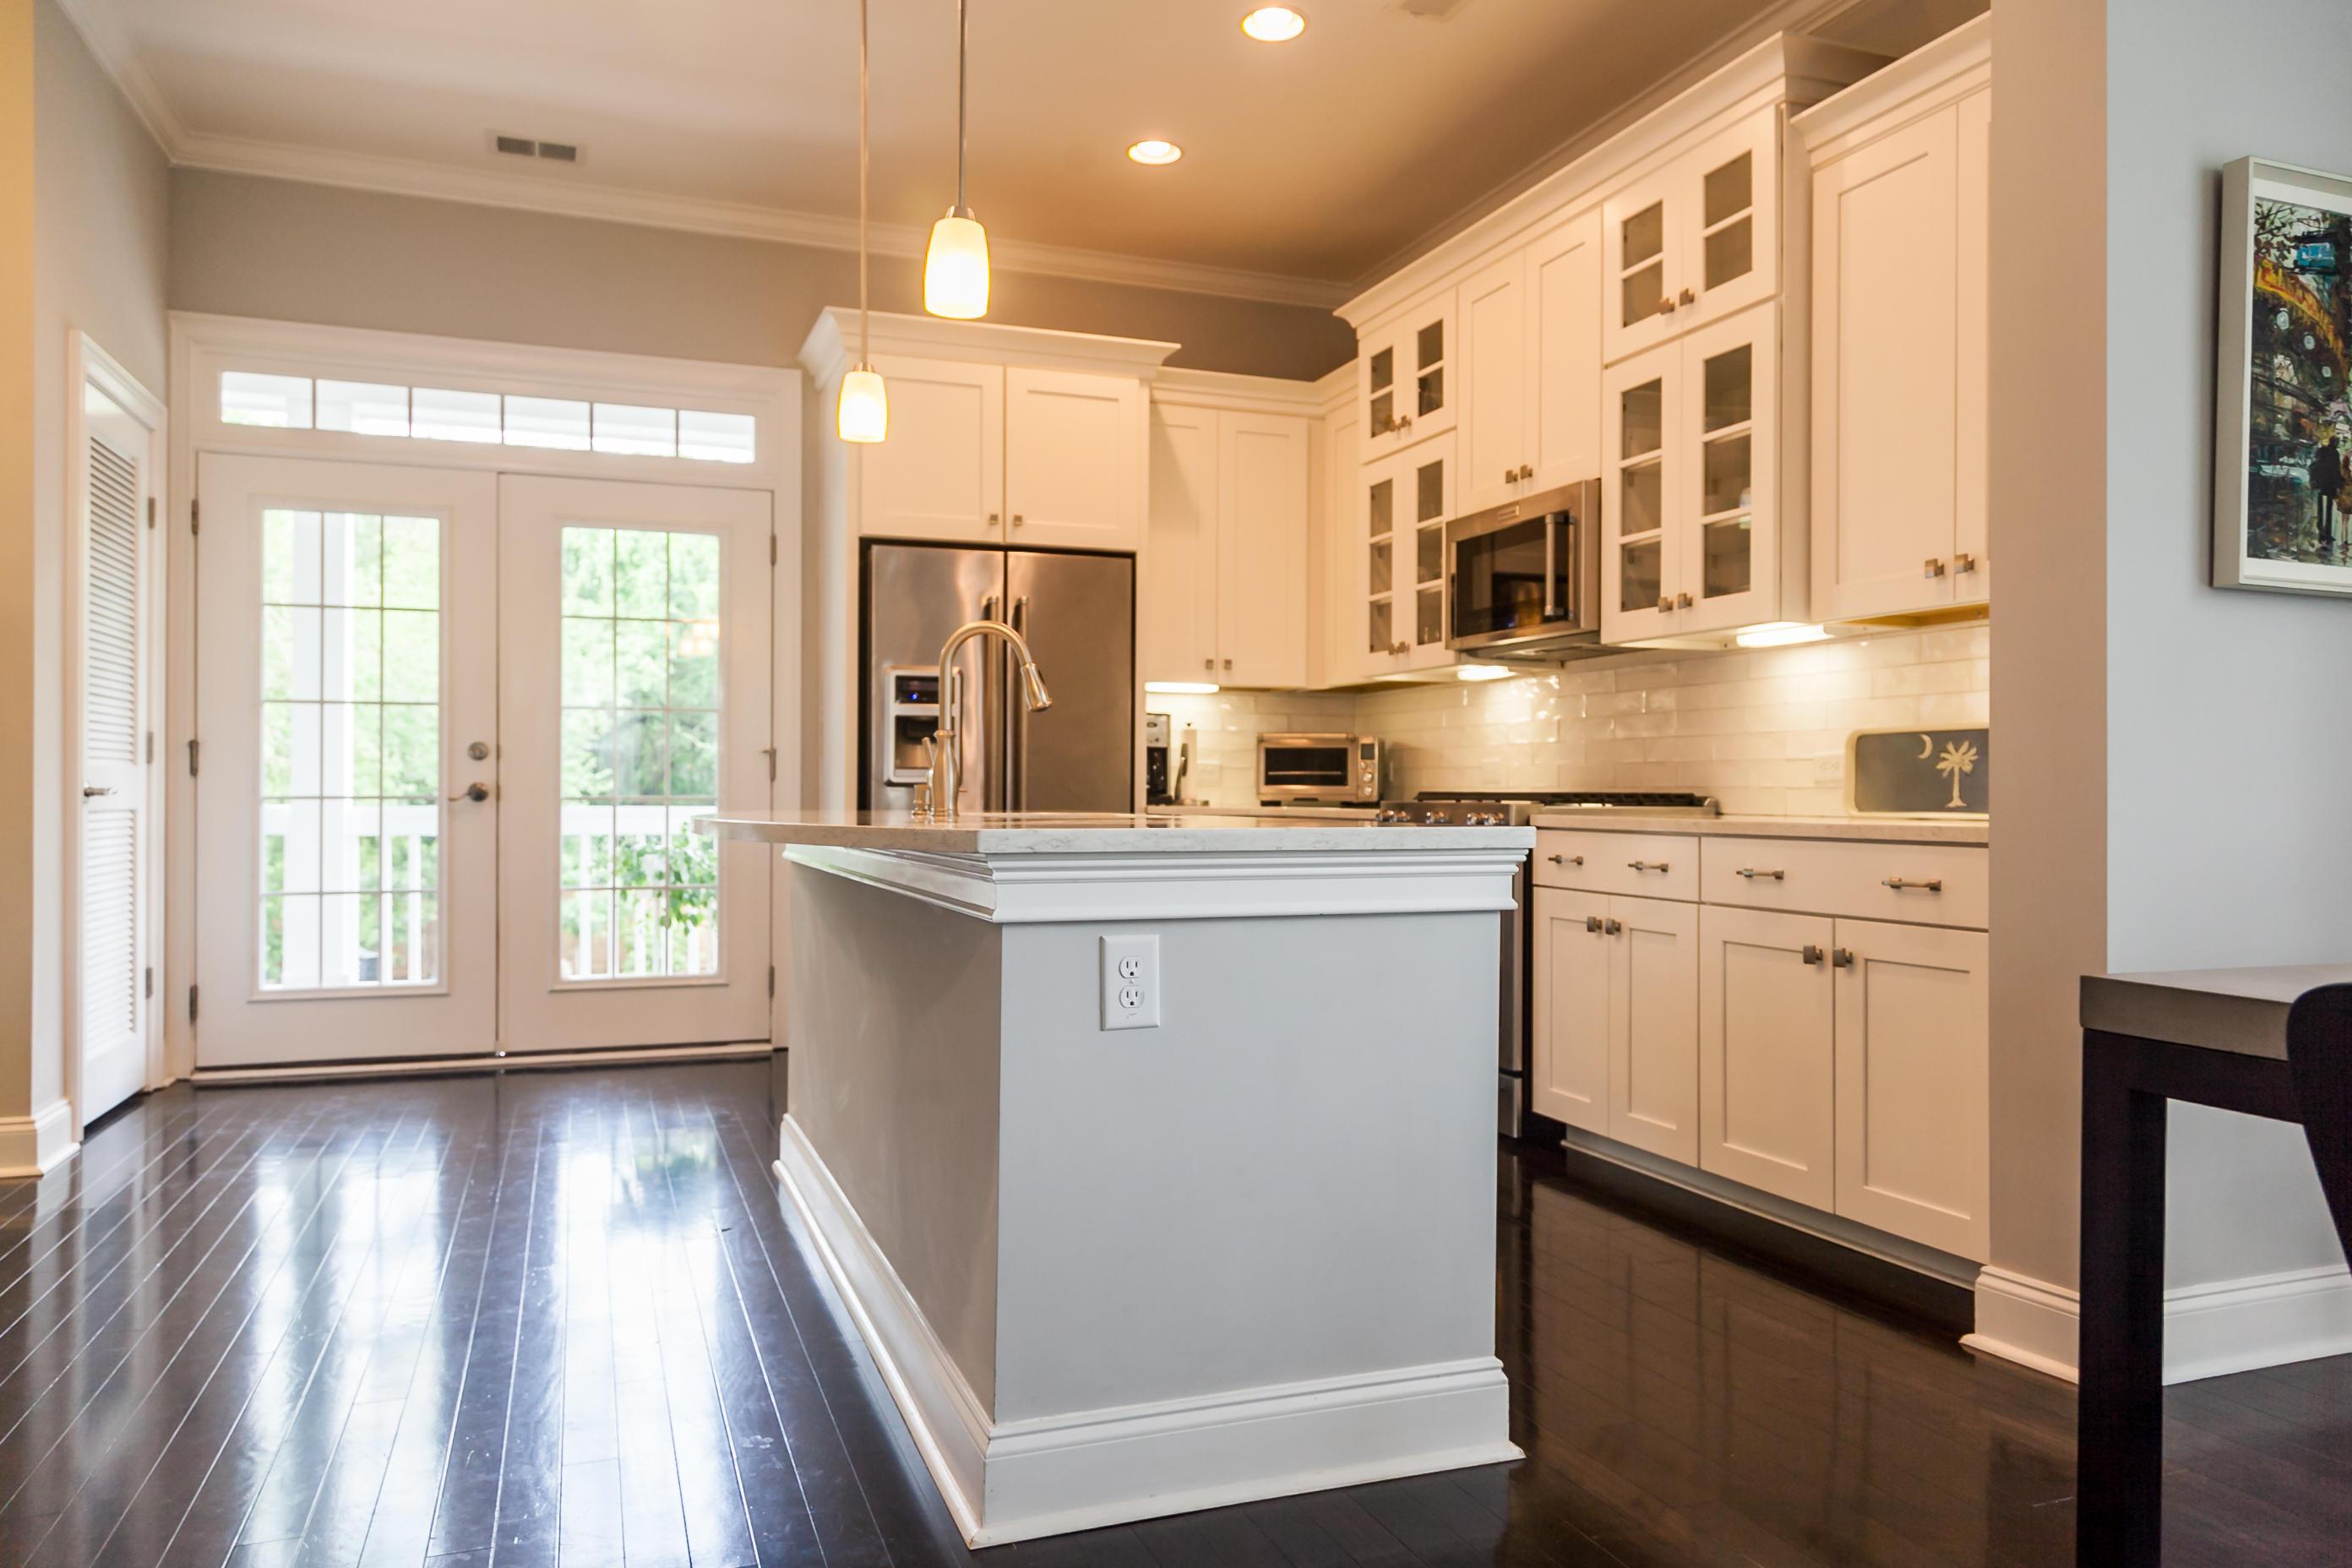 Whitesides Park Homes For Sale - 1319 Myrick, Mount Pleasant, SC - 17